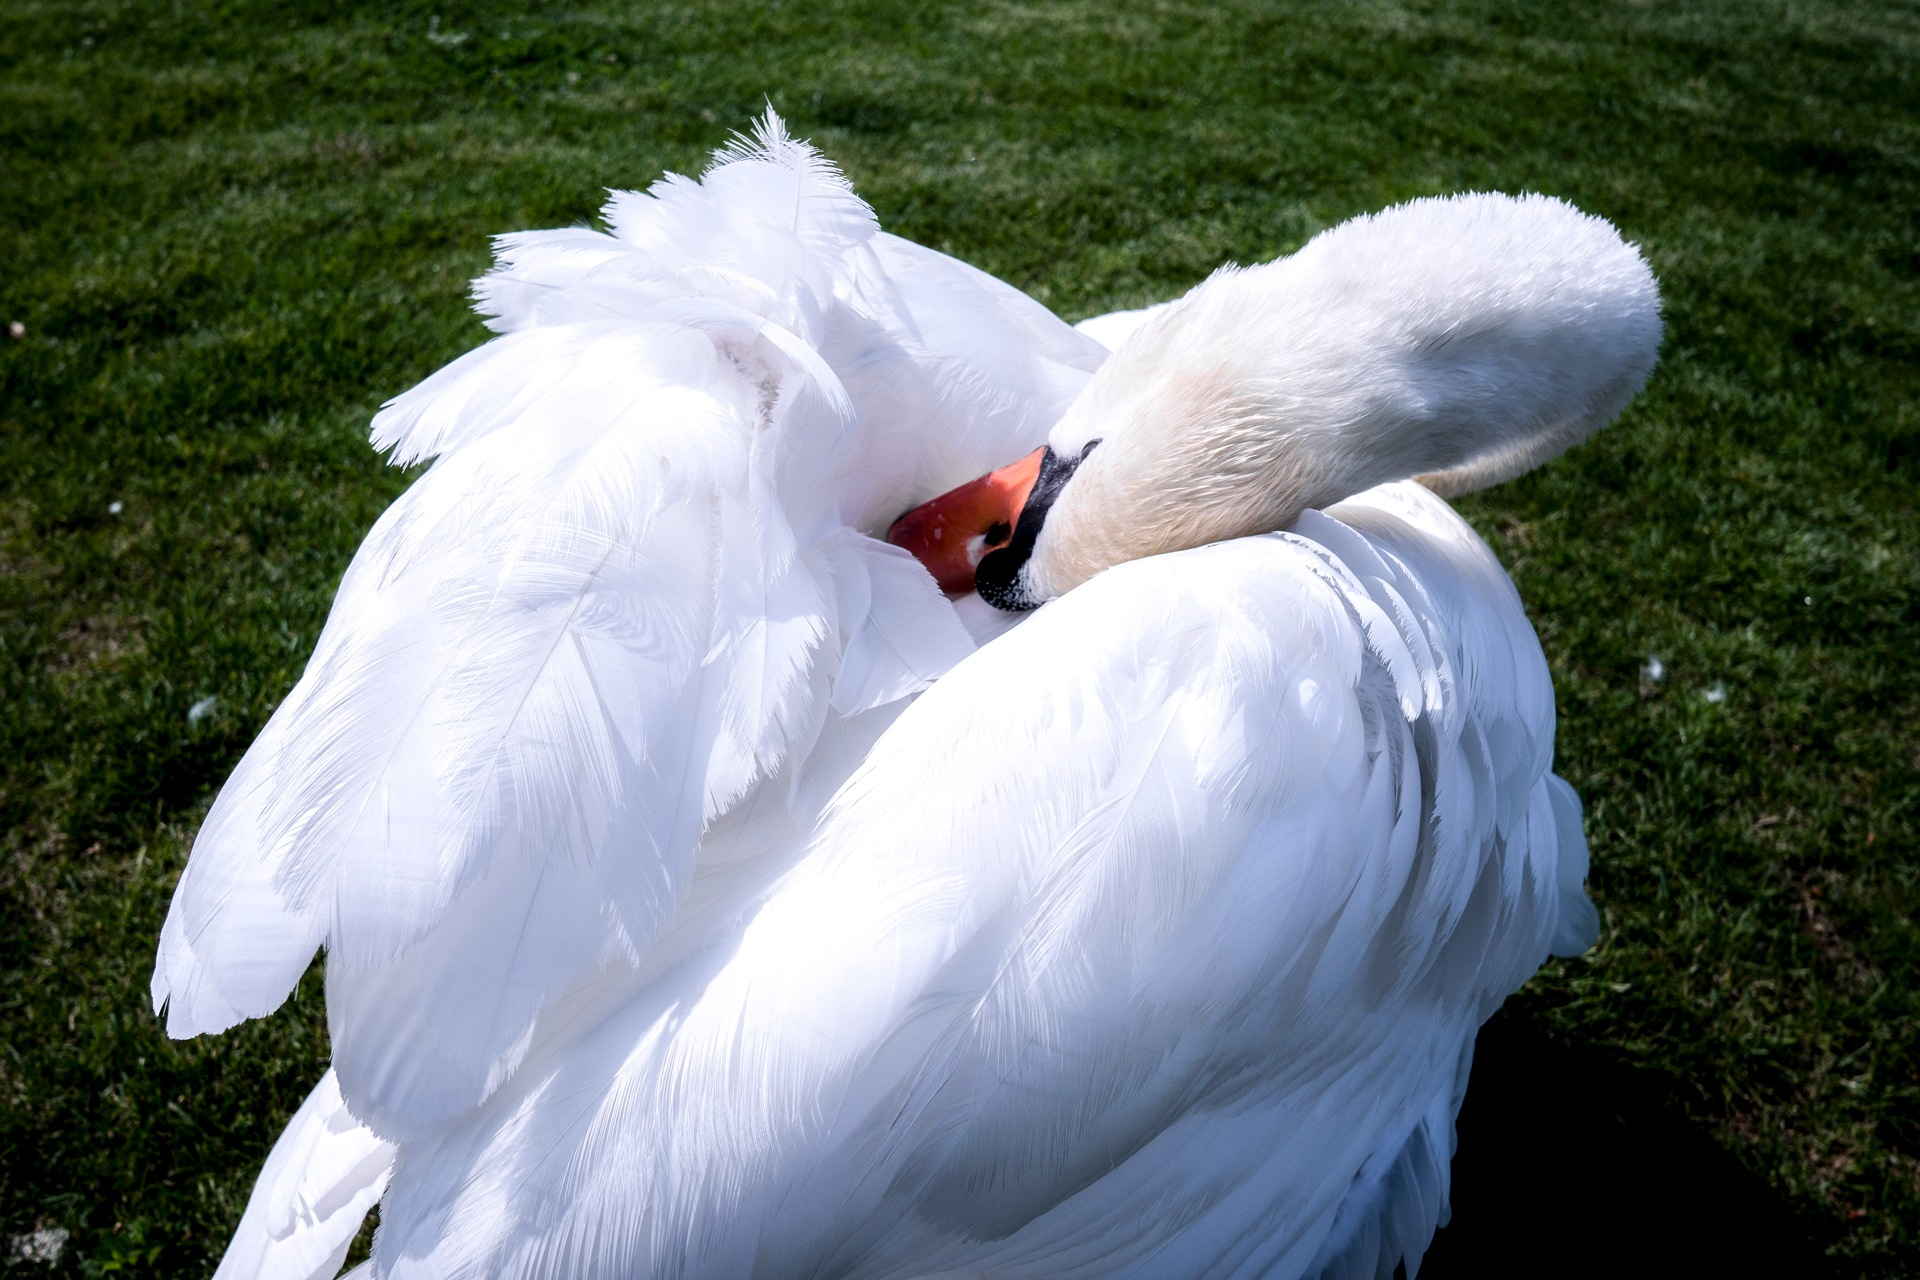 My shyness swan by Venelin Todorov